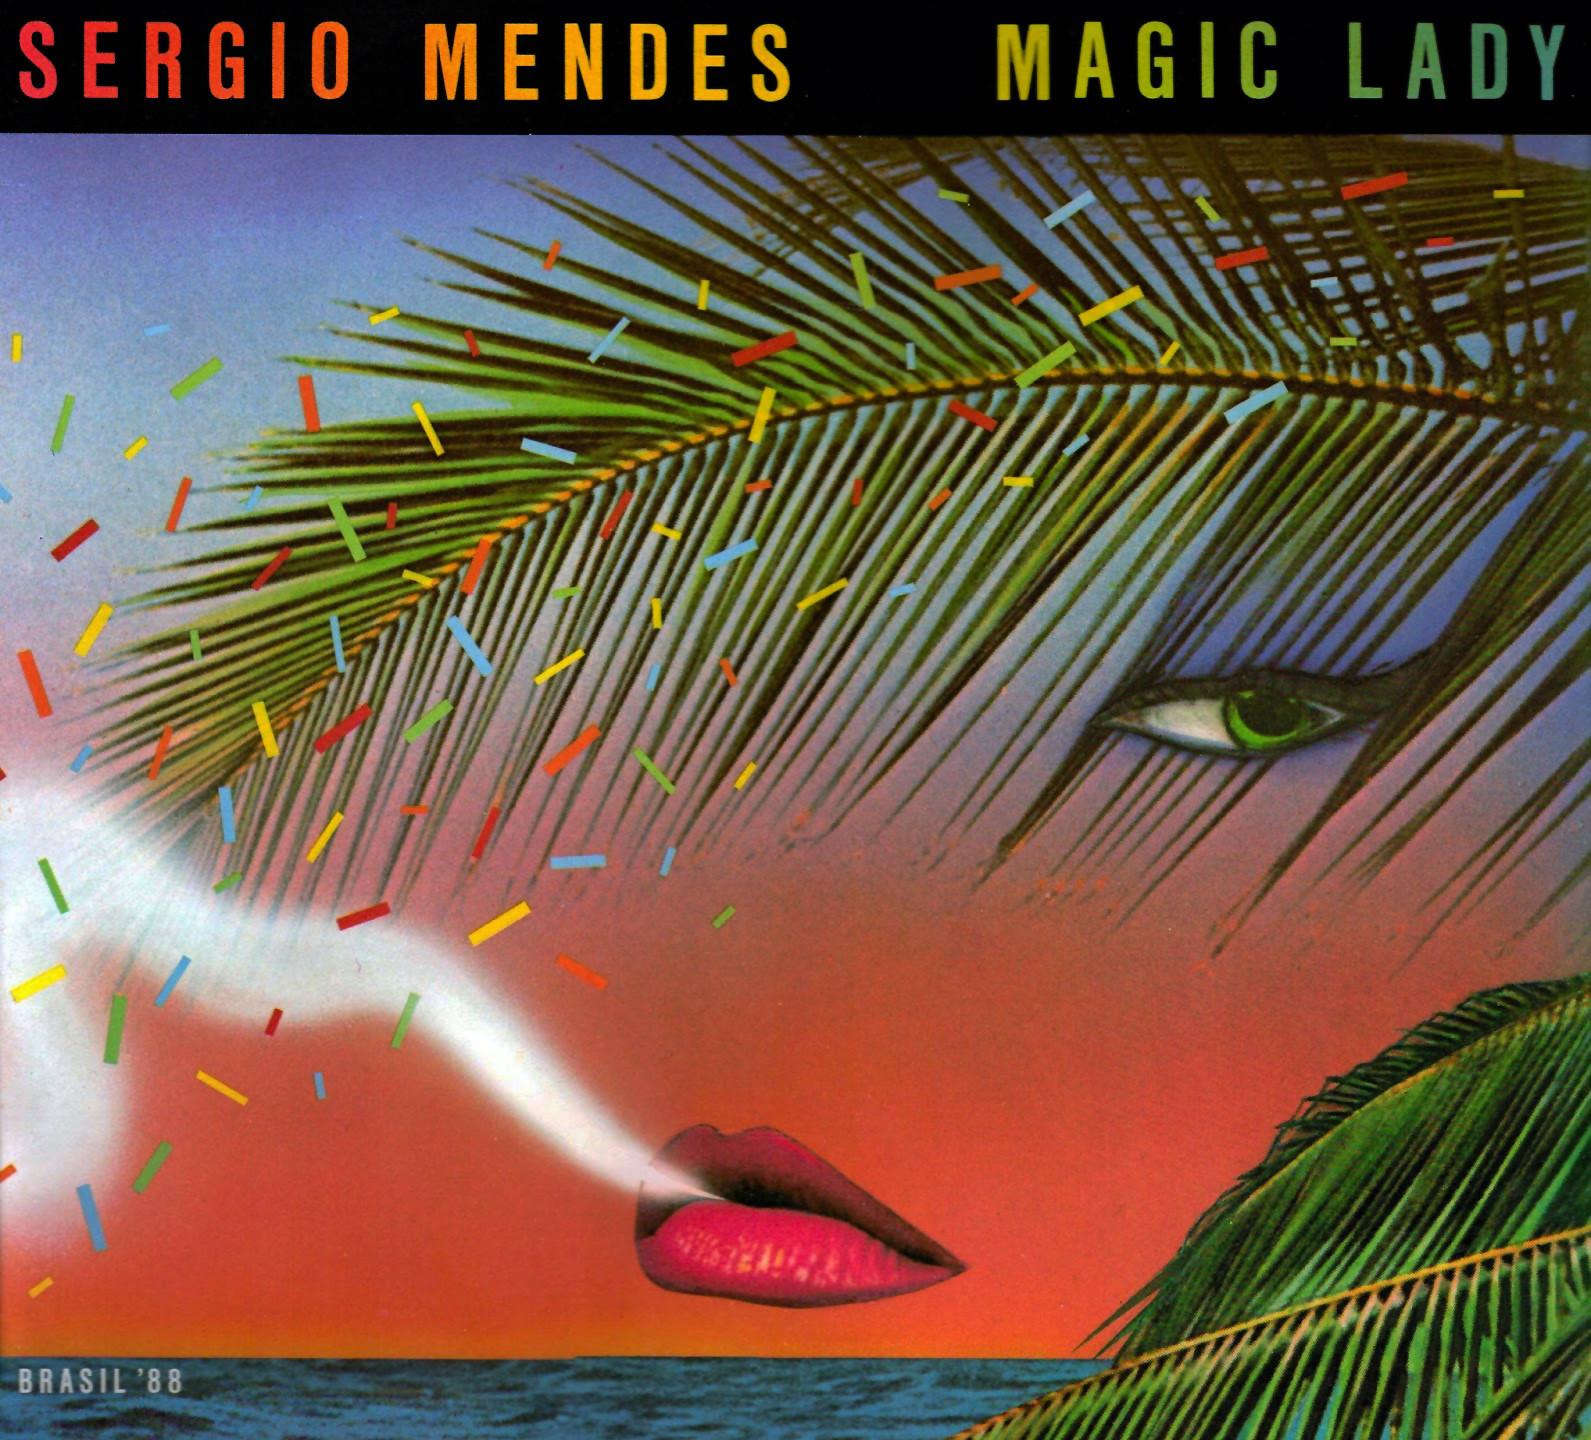 Sergio Mendes & Brasil '88 - Magic Lady (Elektra, 1979). Cover art by Lou Beach.